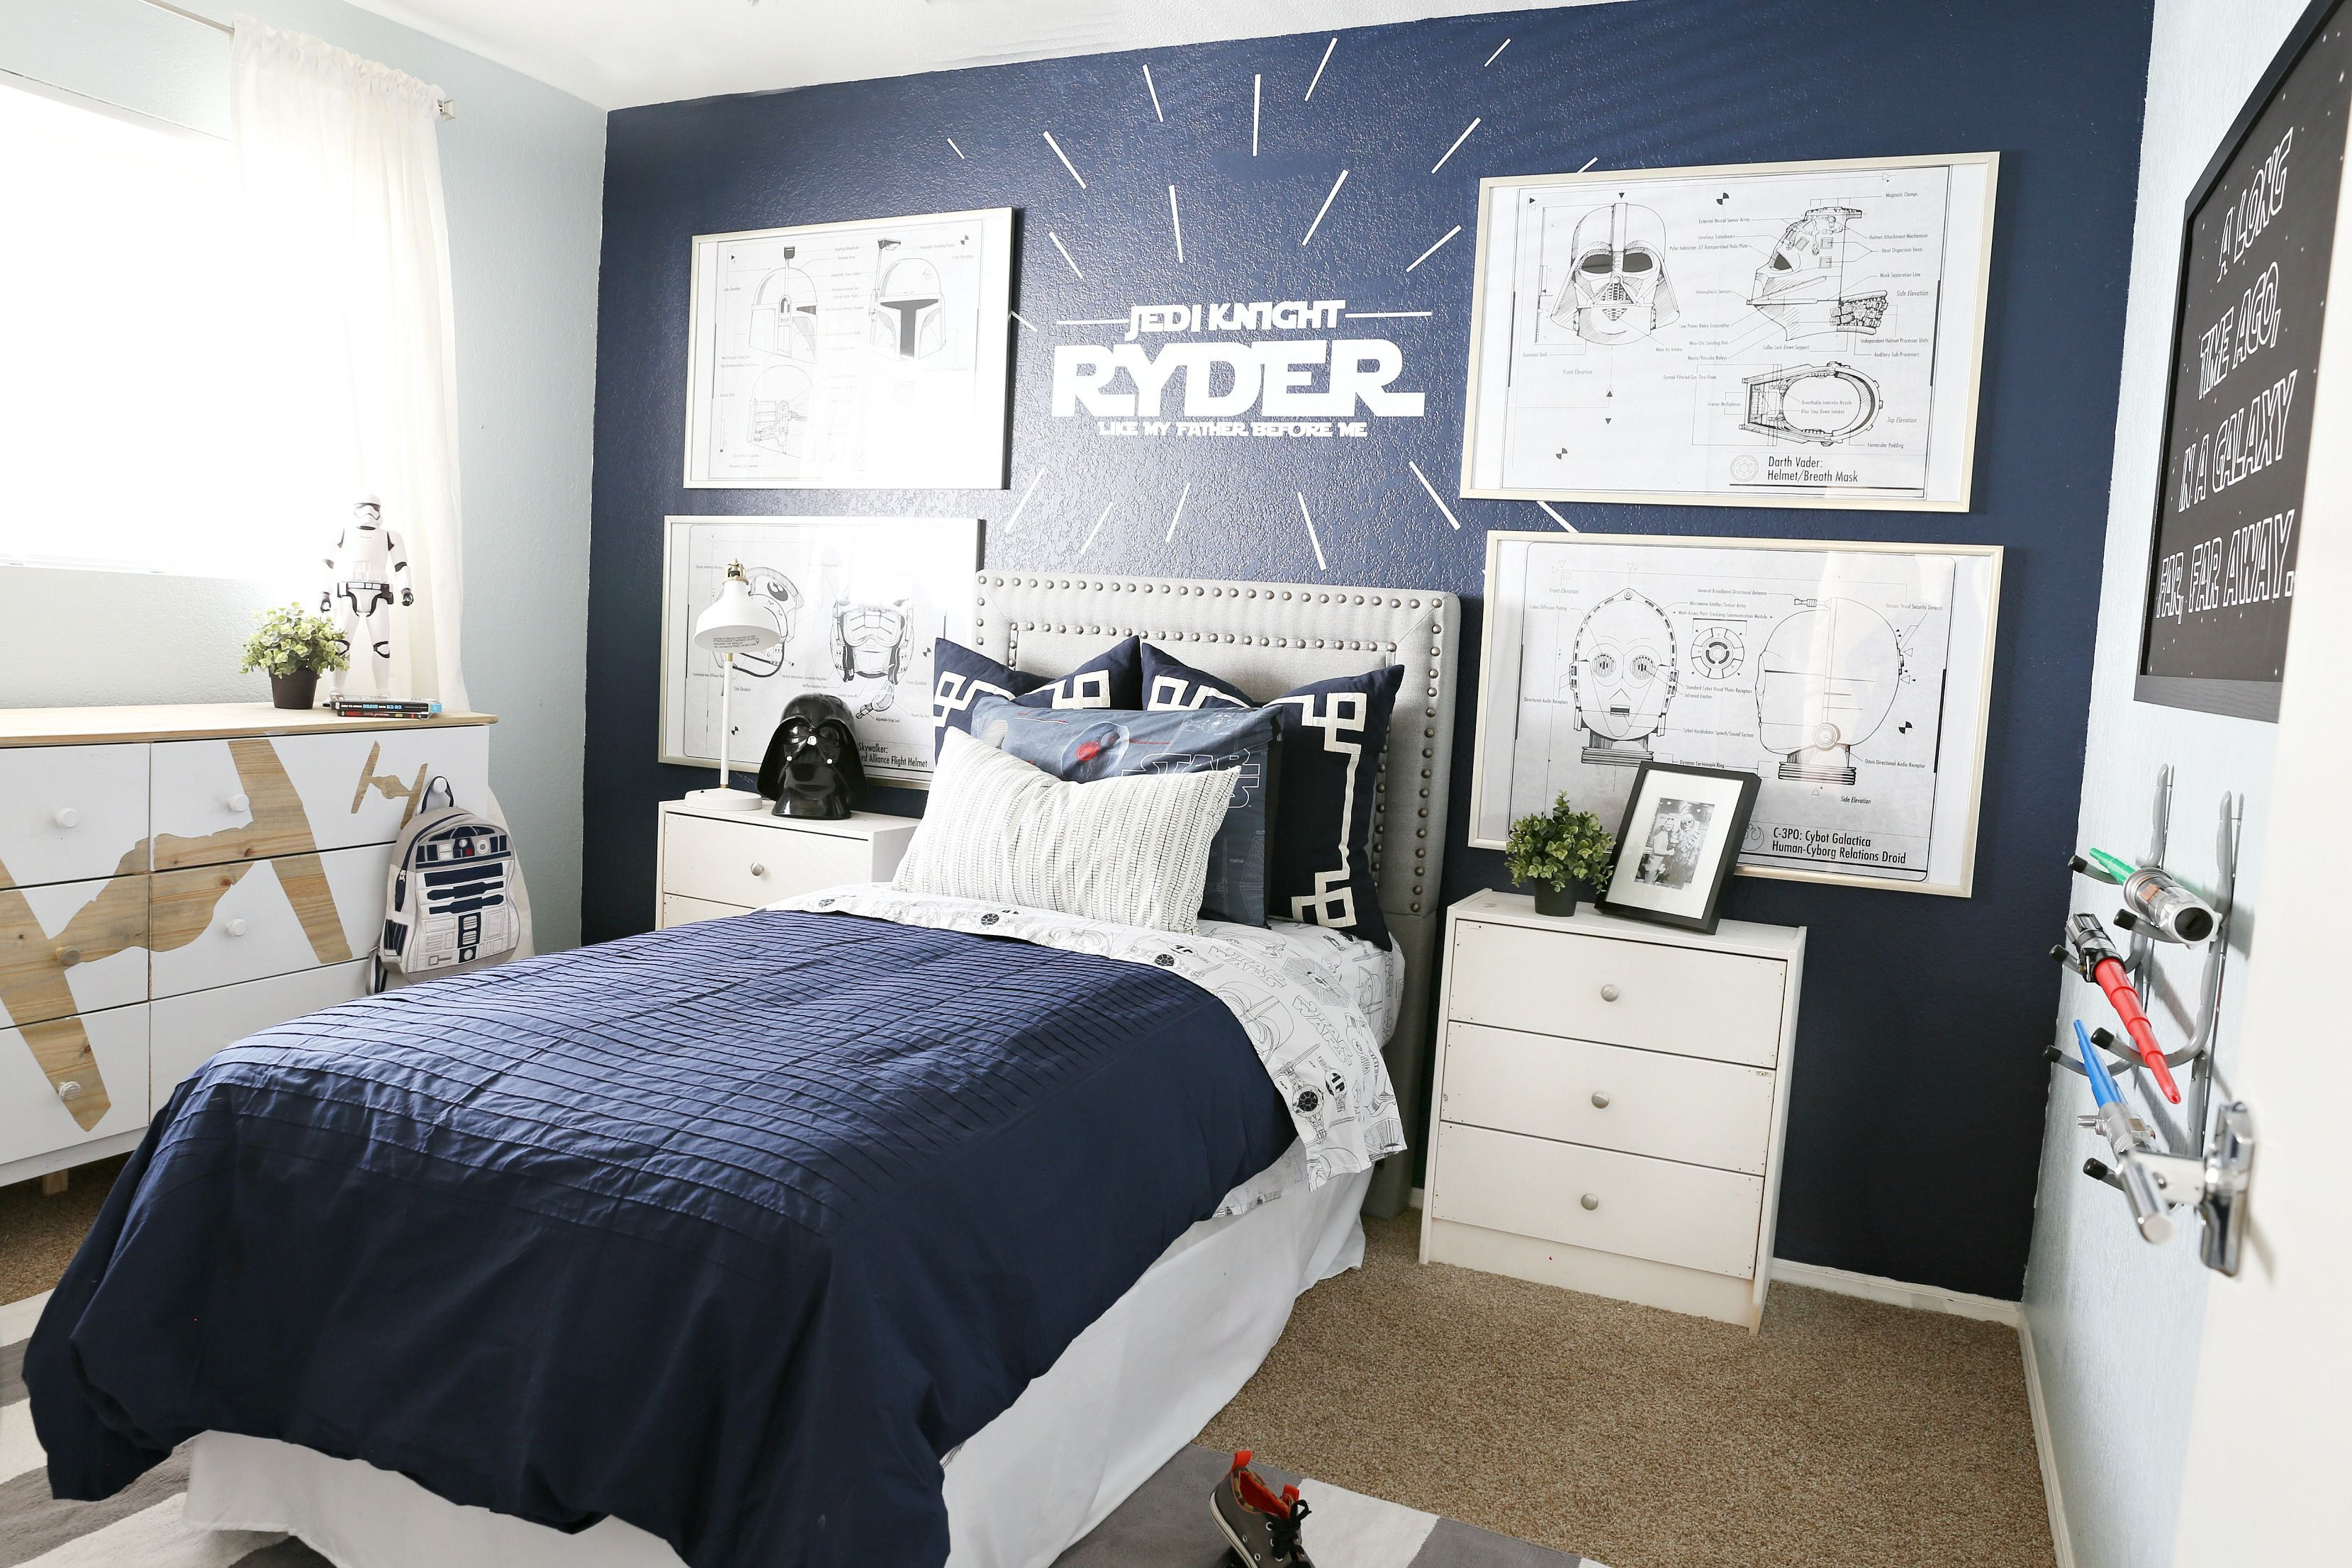 mesmerizing star wars bedroom decor in 21 creative bedroom ideas for rh pinterest com